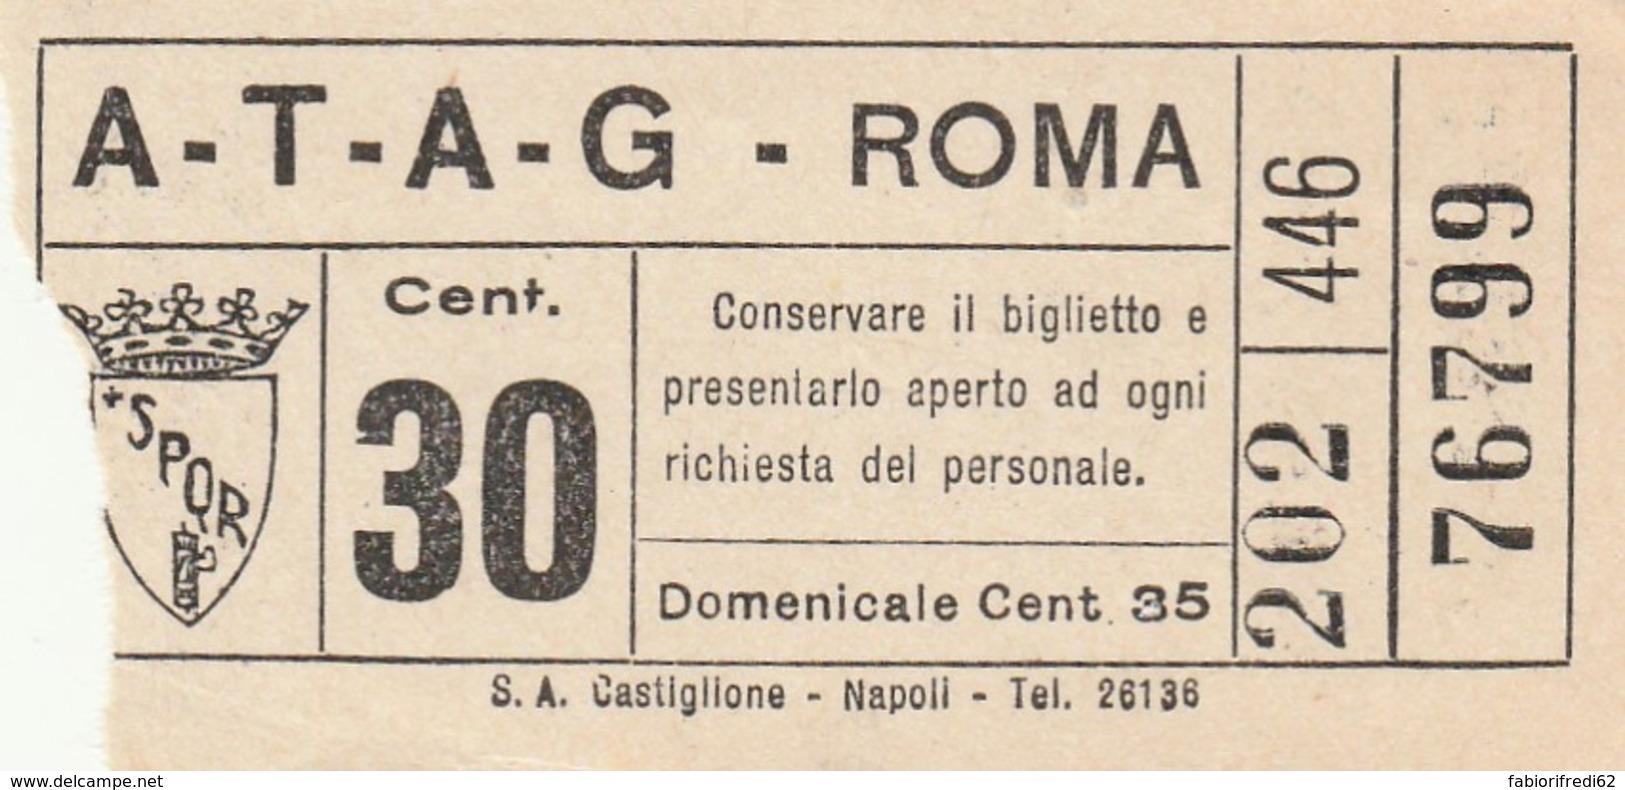 BIGLIETTO BUS TRAM ATAG ROMA (BX145 - Bus